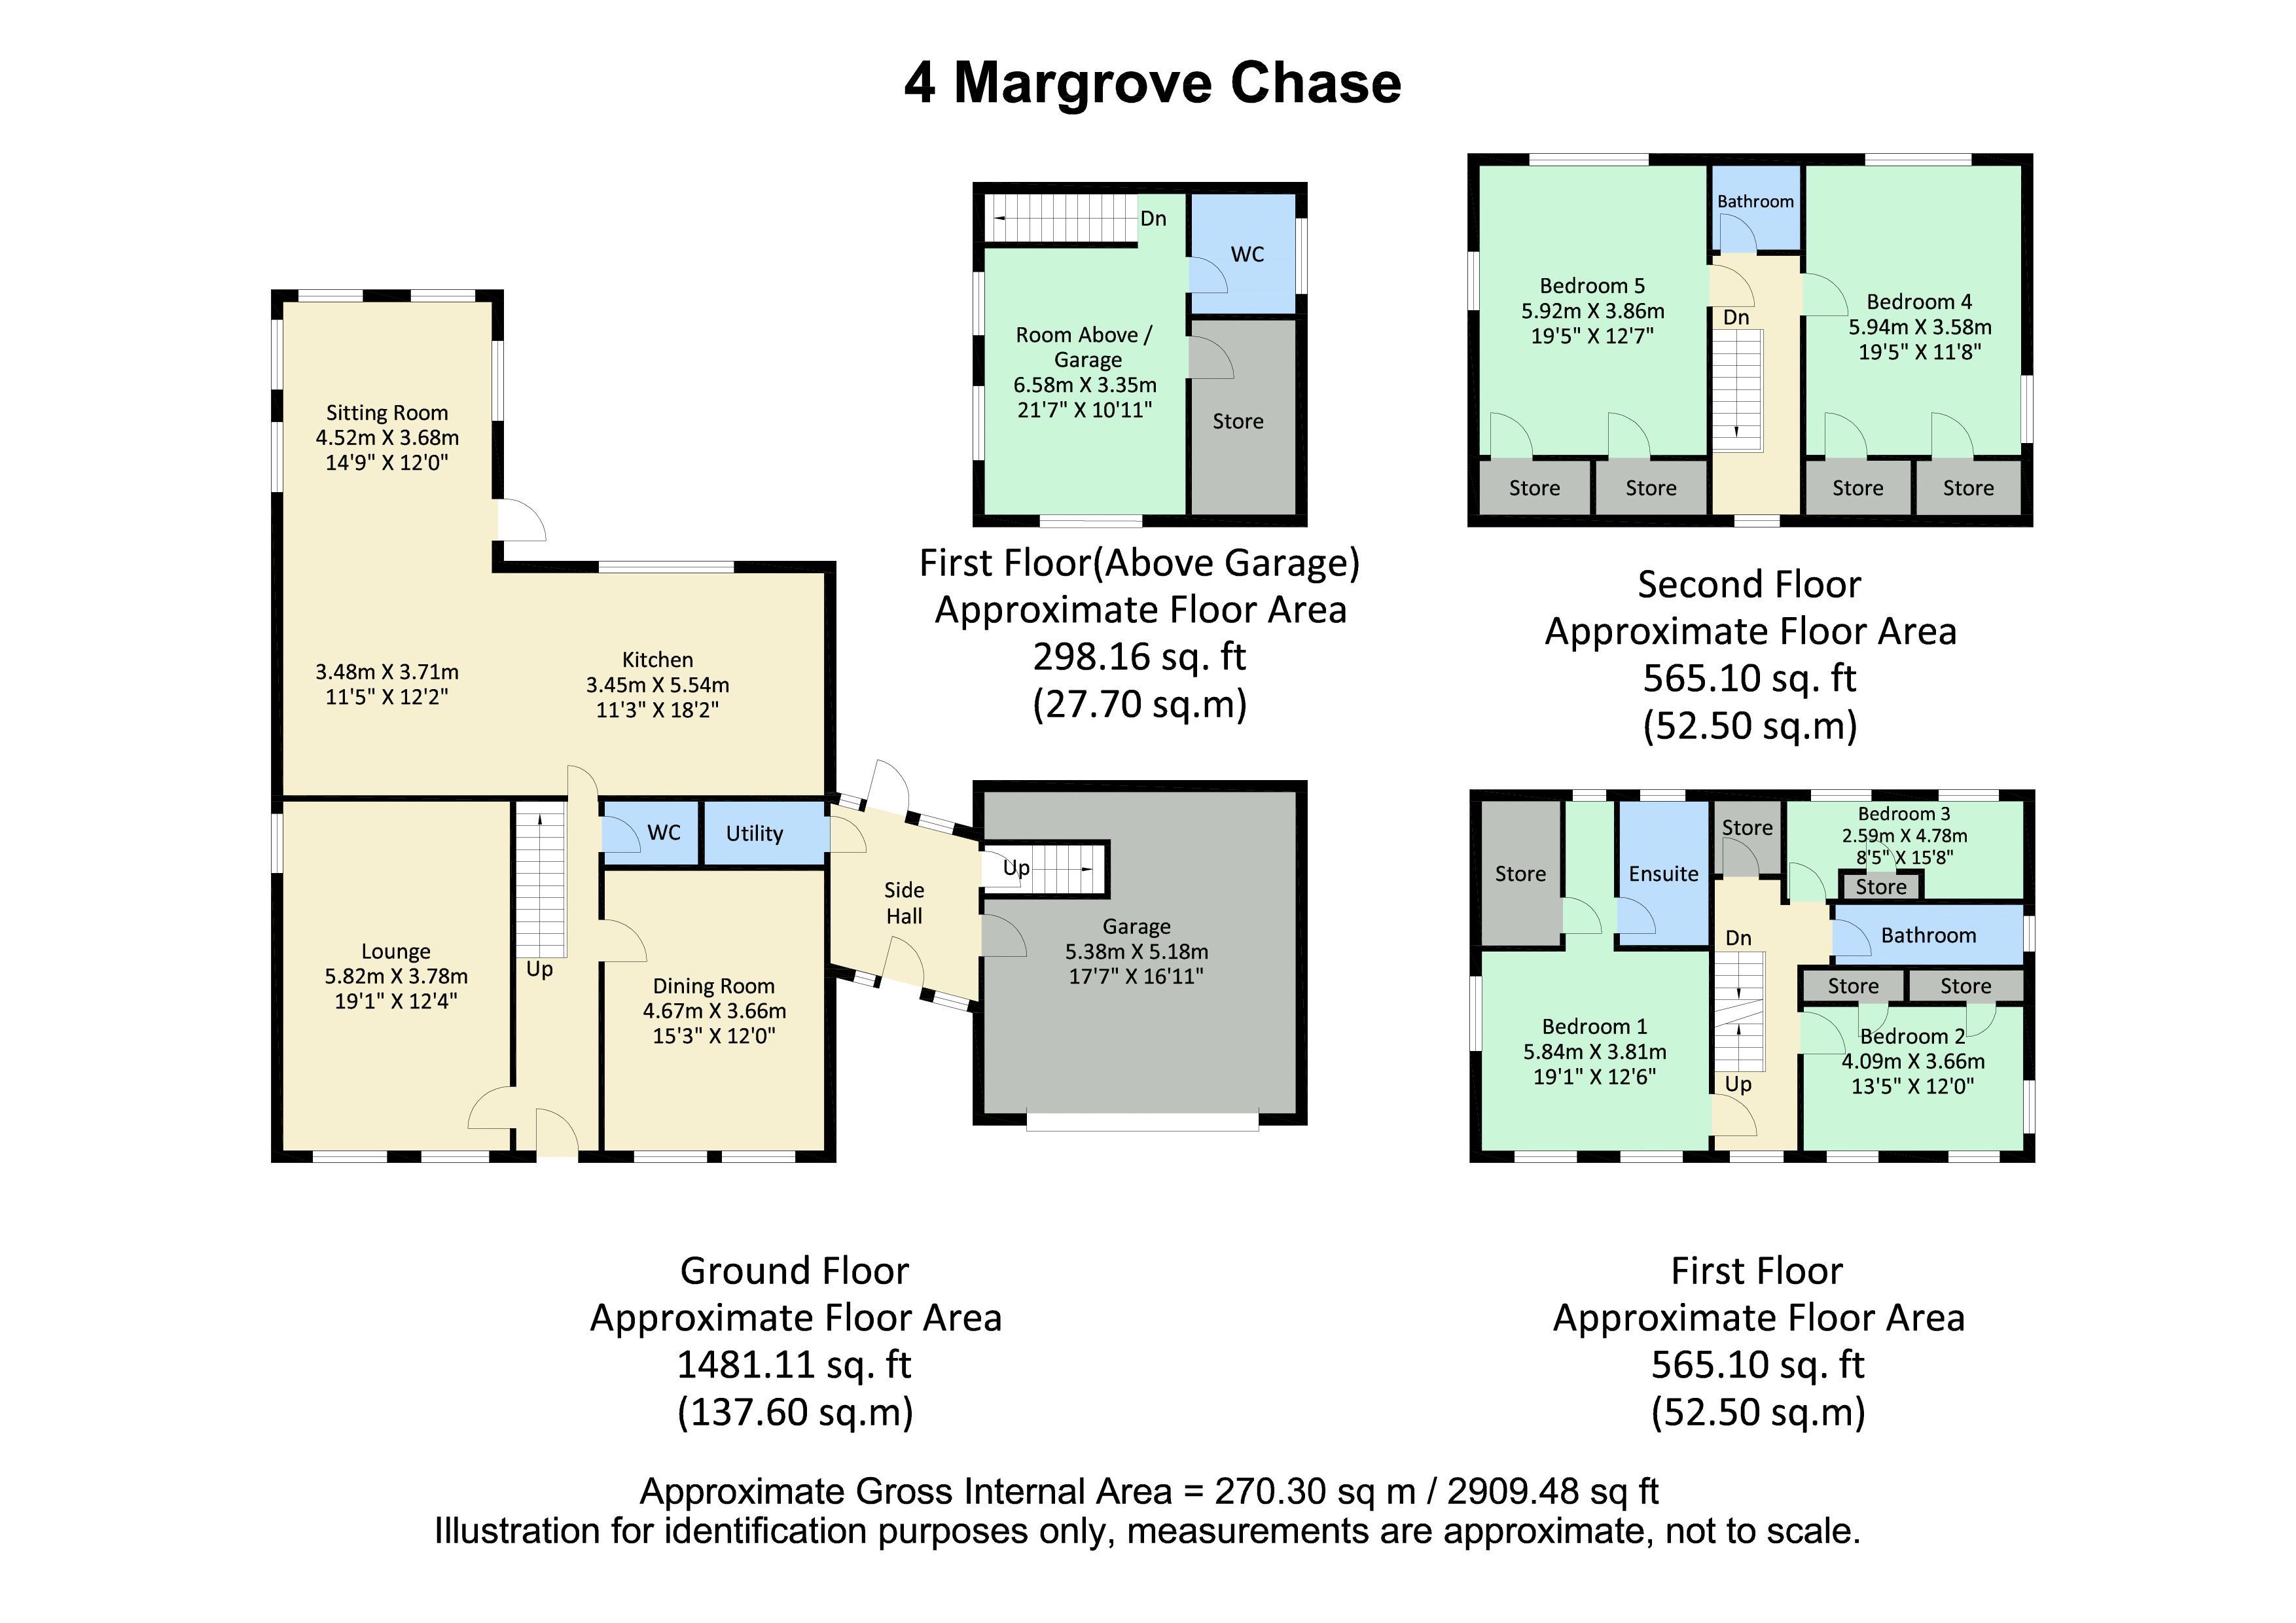 4 Margrove Chase